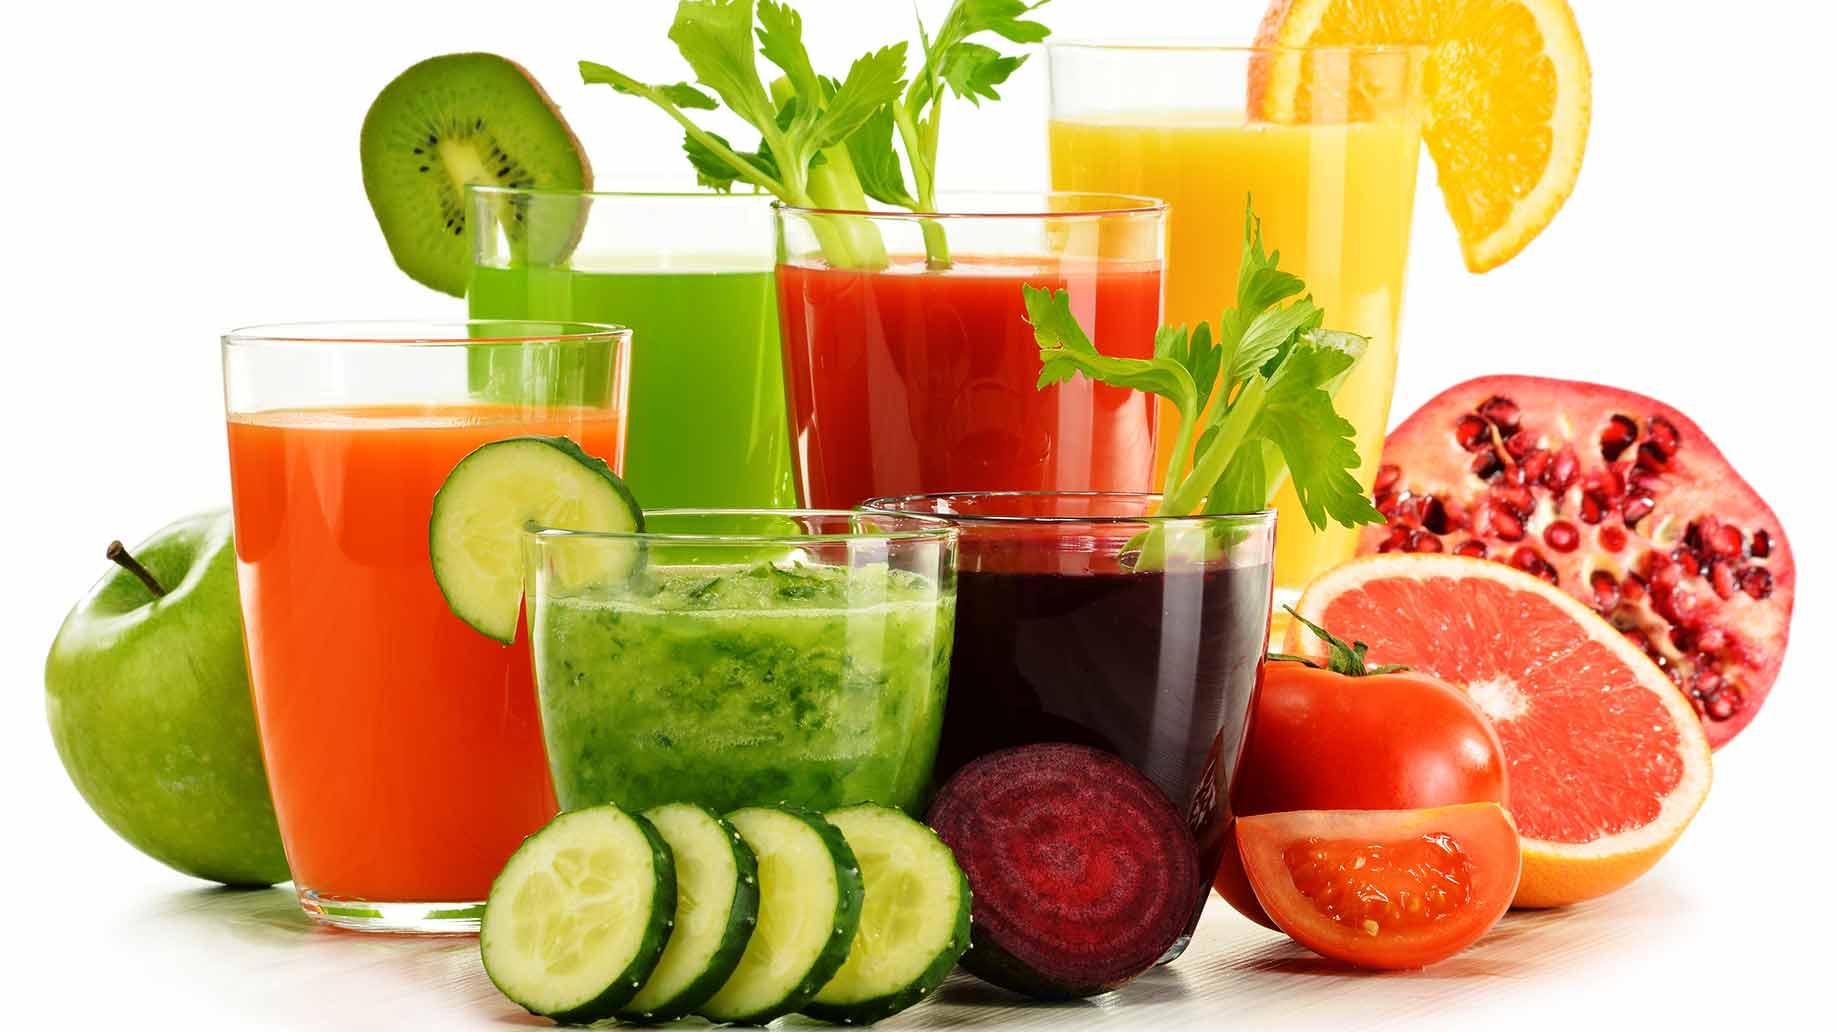 vitamins-minerals-hormone-imbalance-menopause-menses-periods-pms-natural-remedies-balance